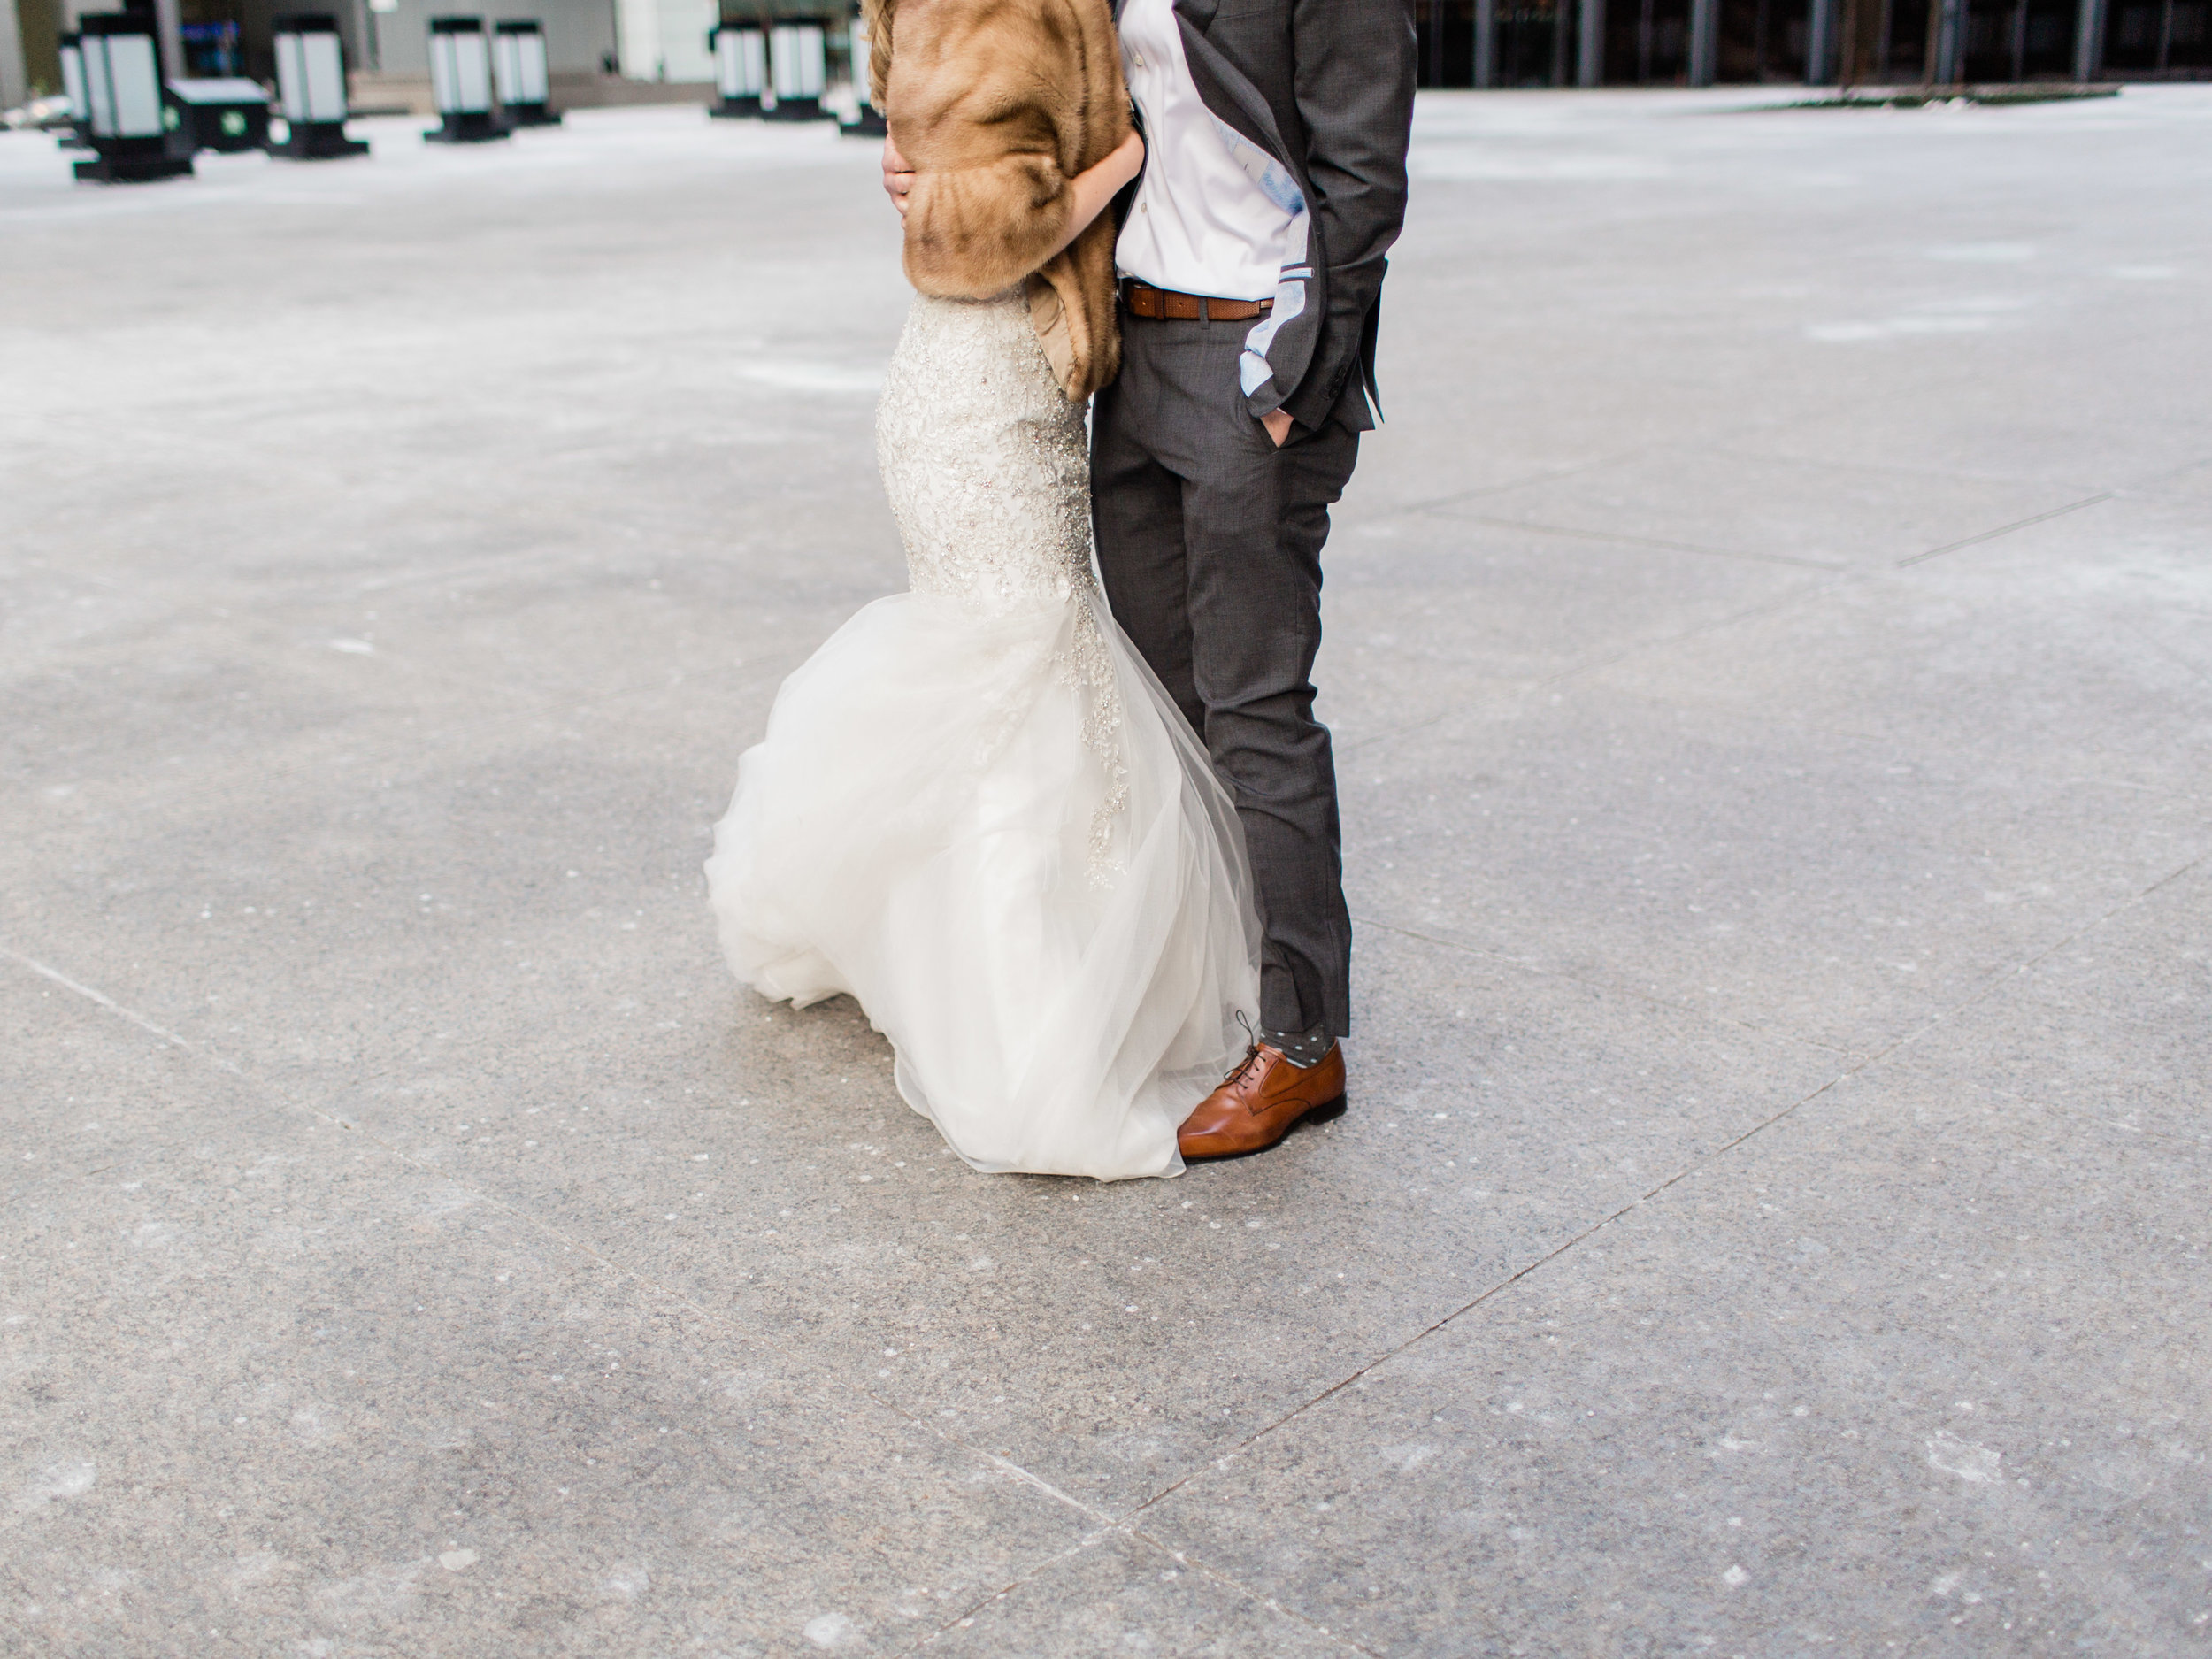 Toronto-wedding-photographer-downtown-winter-wedding-intimate-restaurant-canoe112.jpg